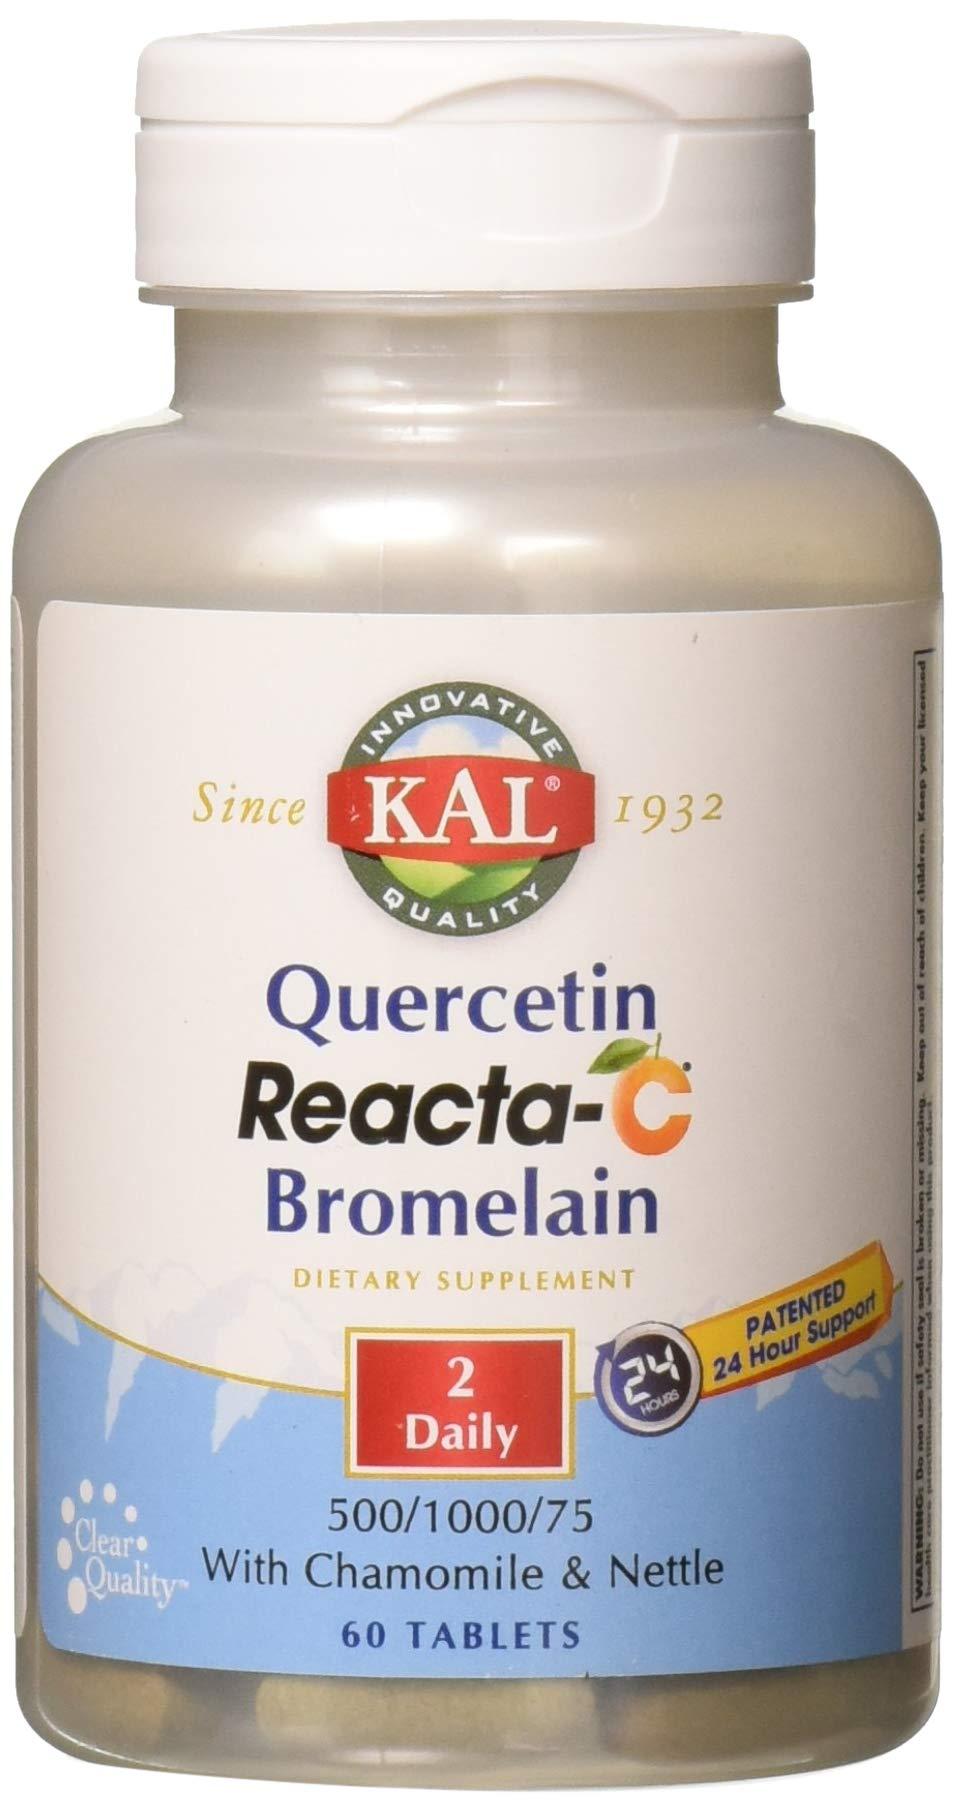 Kal Quercetin Reacta-c Bromelain Tablets, 60 Count